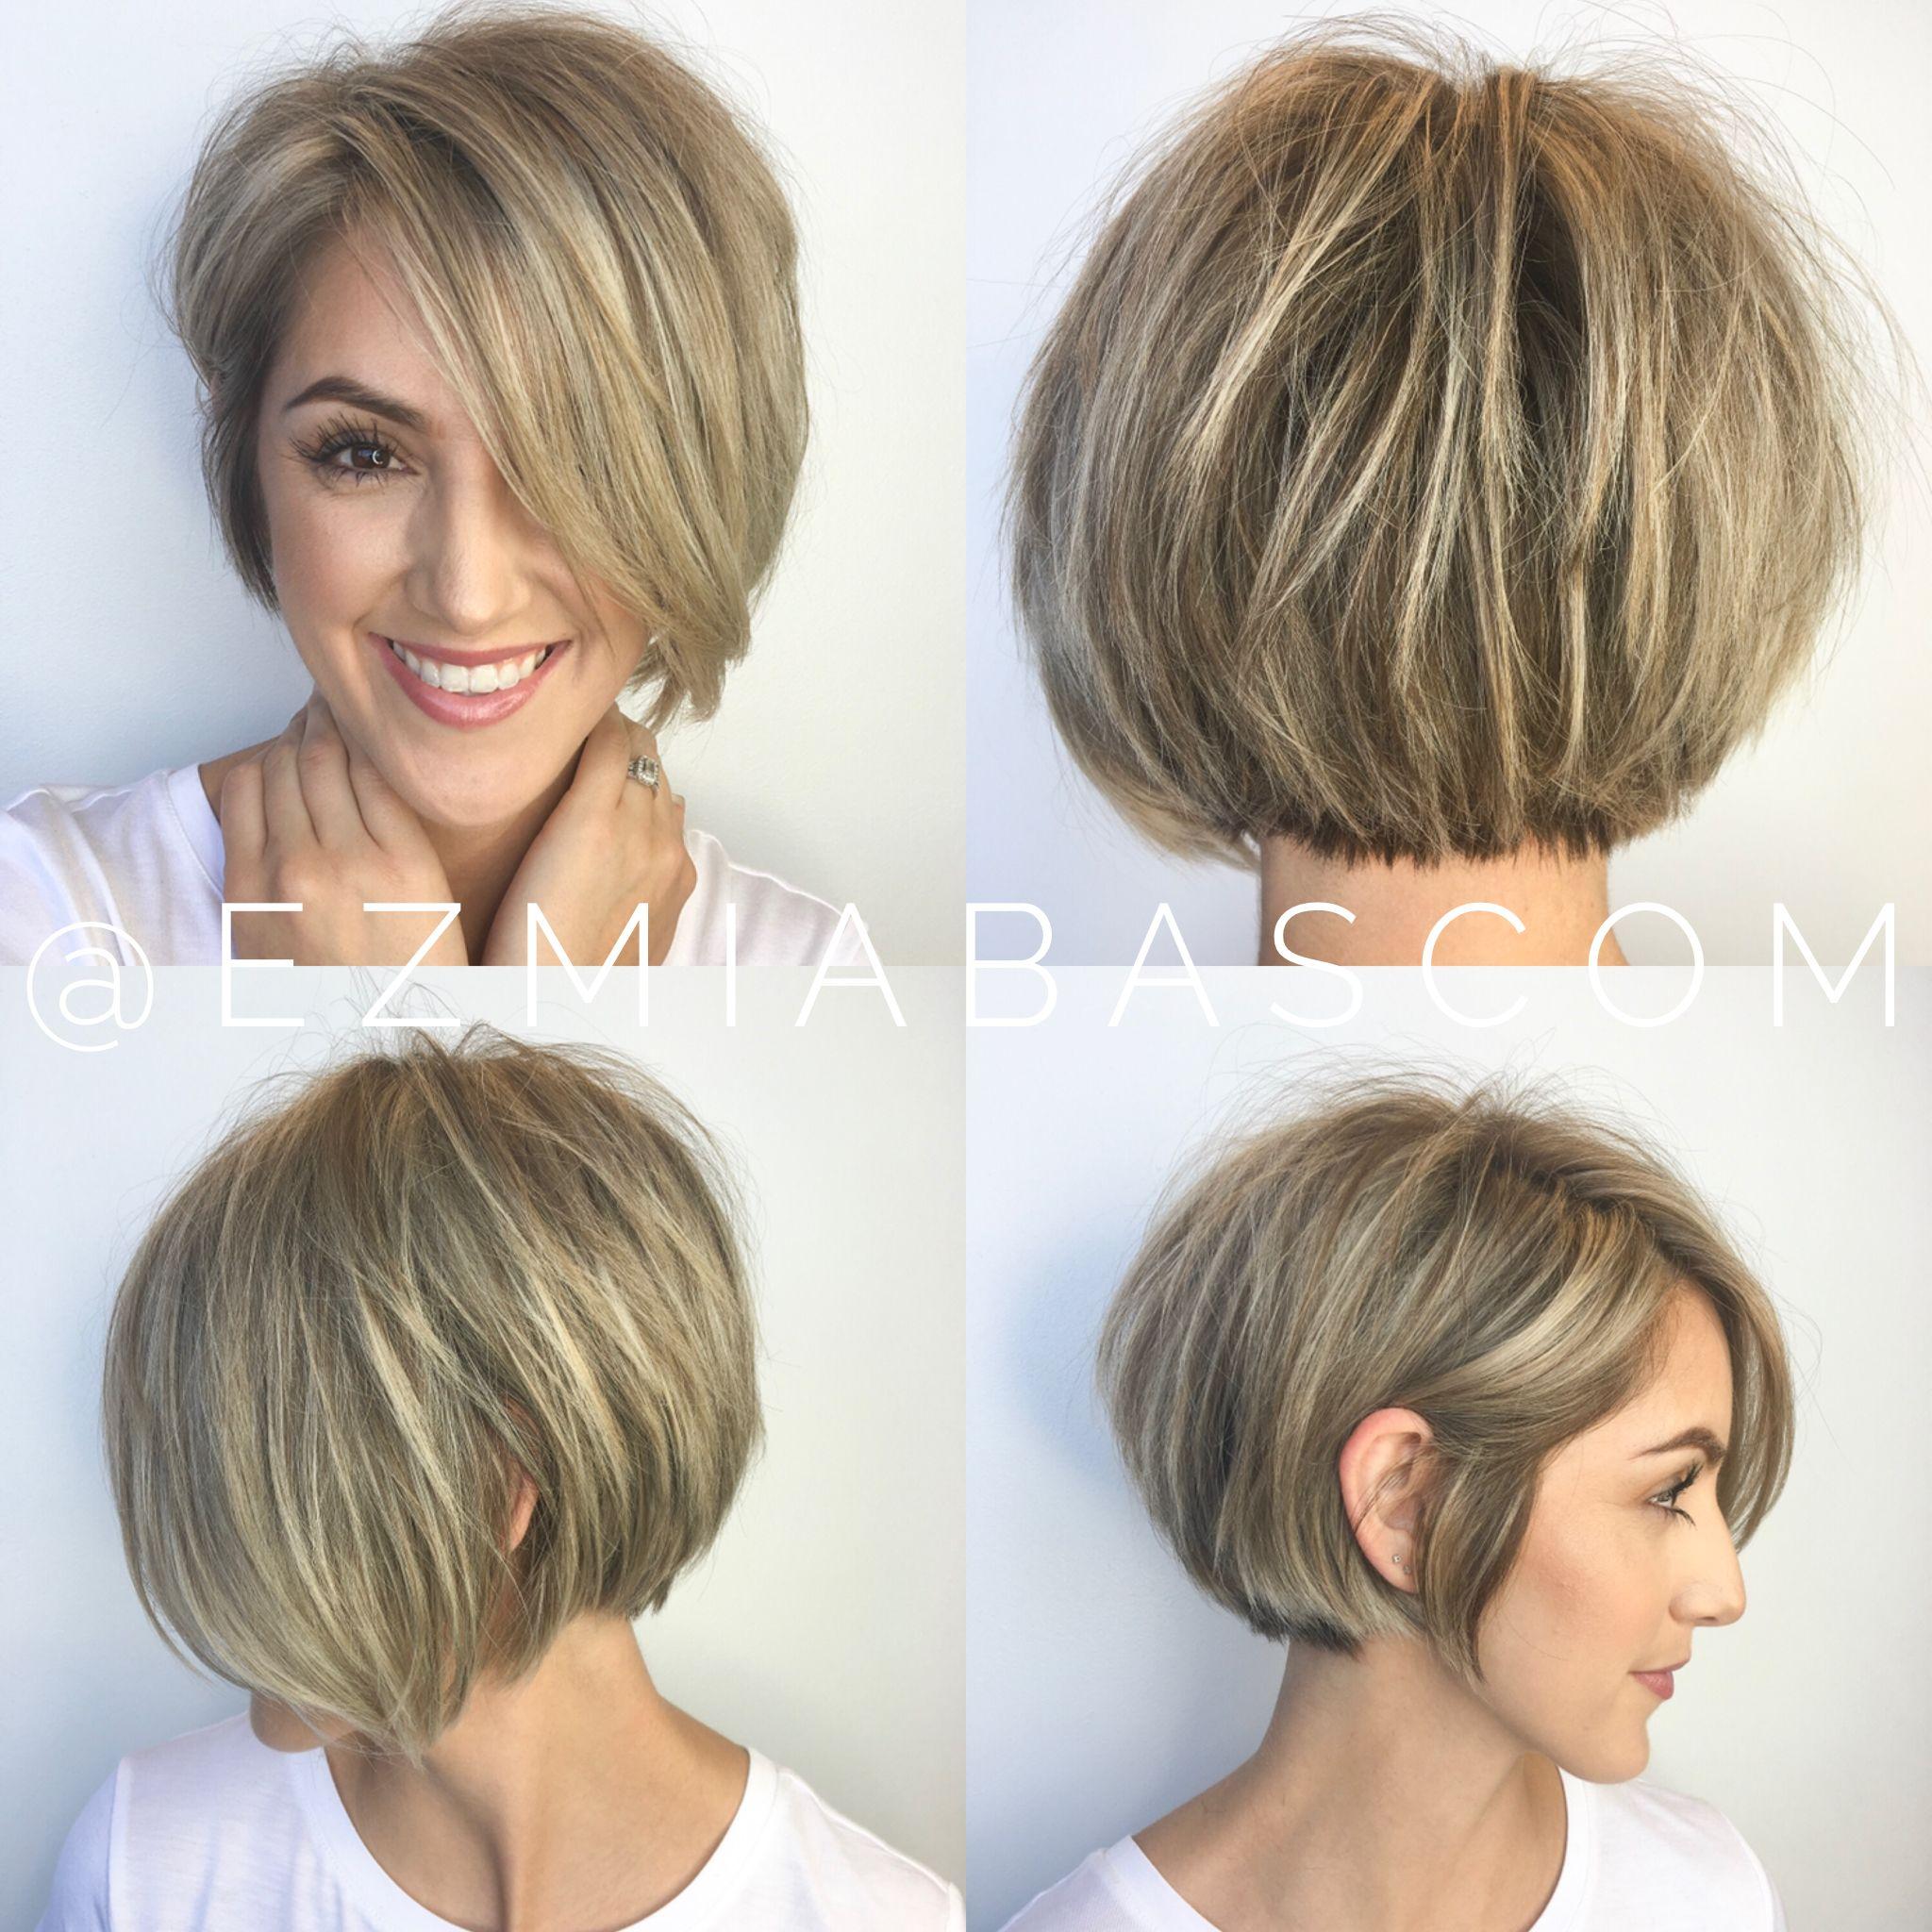 28++ Pixie bob hairstyles info